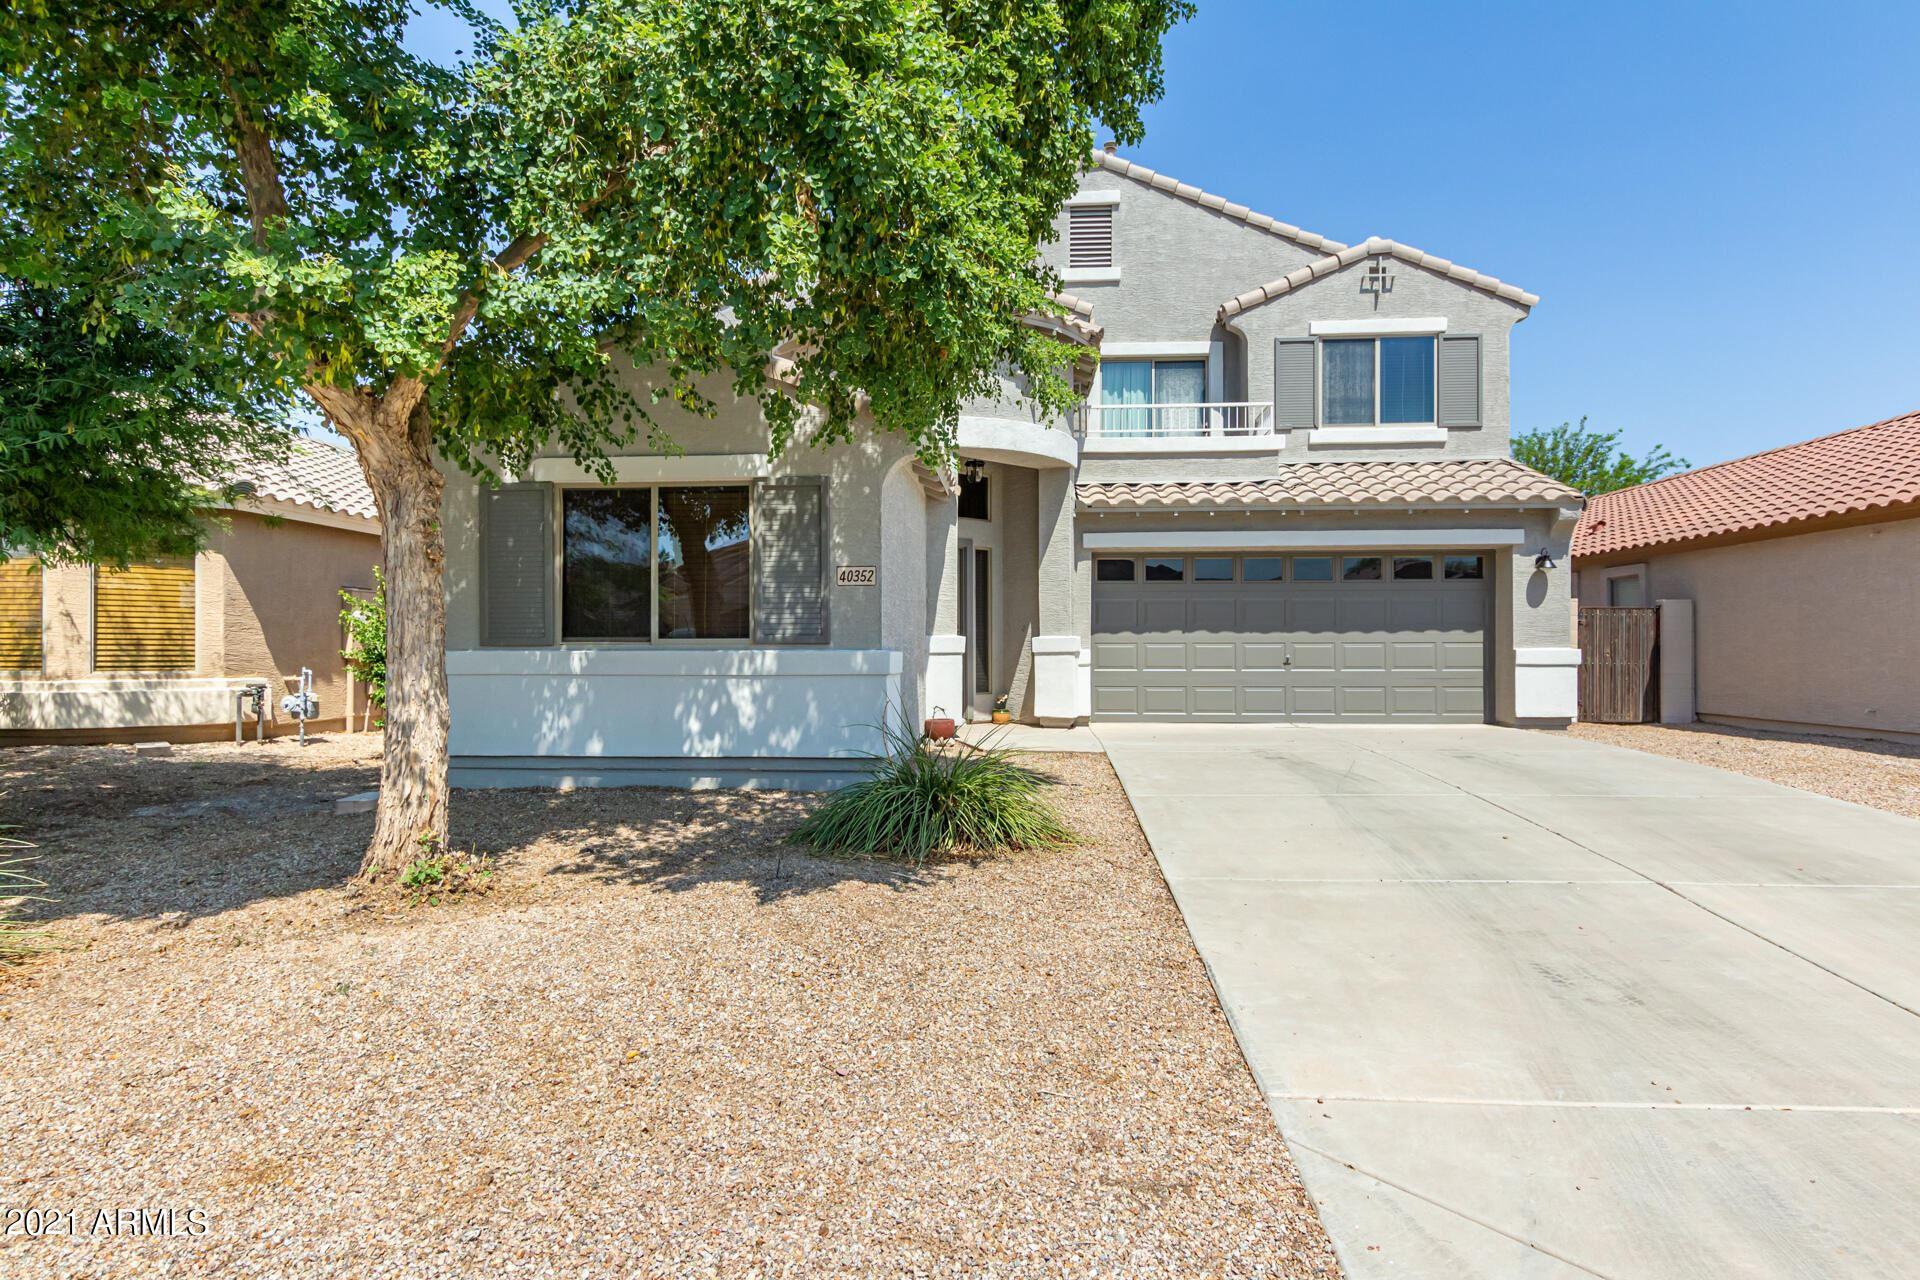 Photo for 40352 W NOVAK Lane, Maricopa, AZ 85138 (MLS # 6292194)